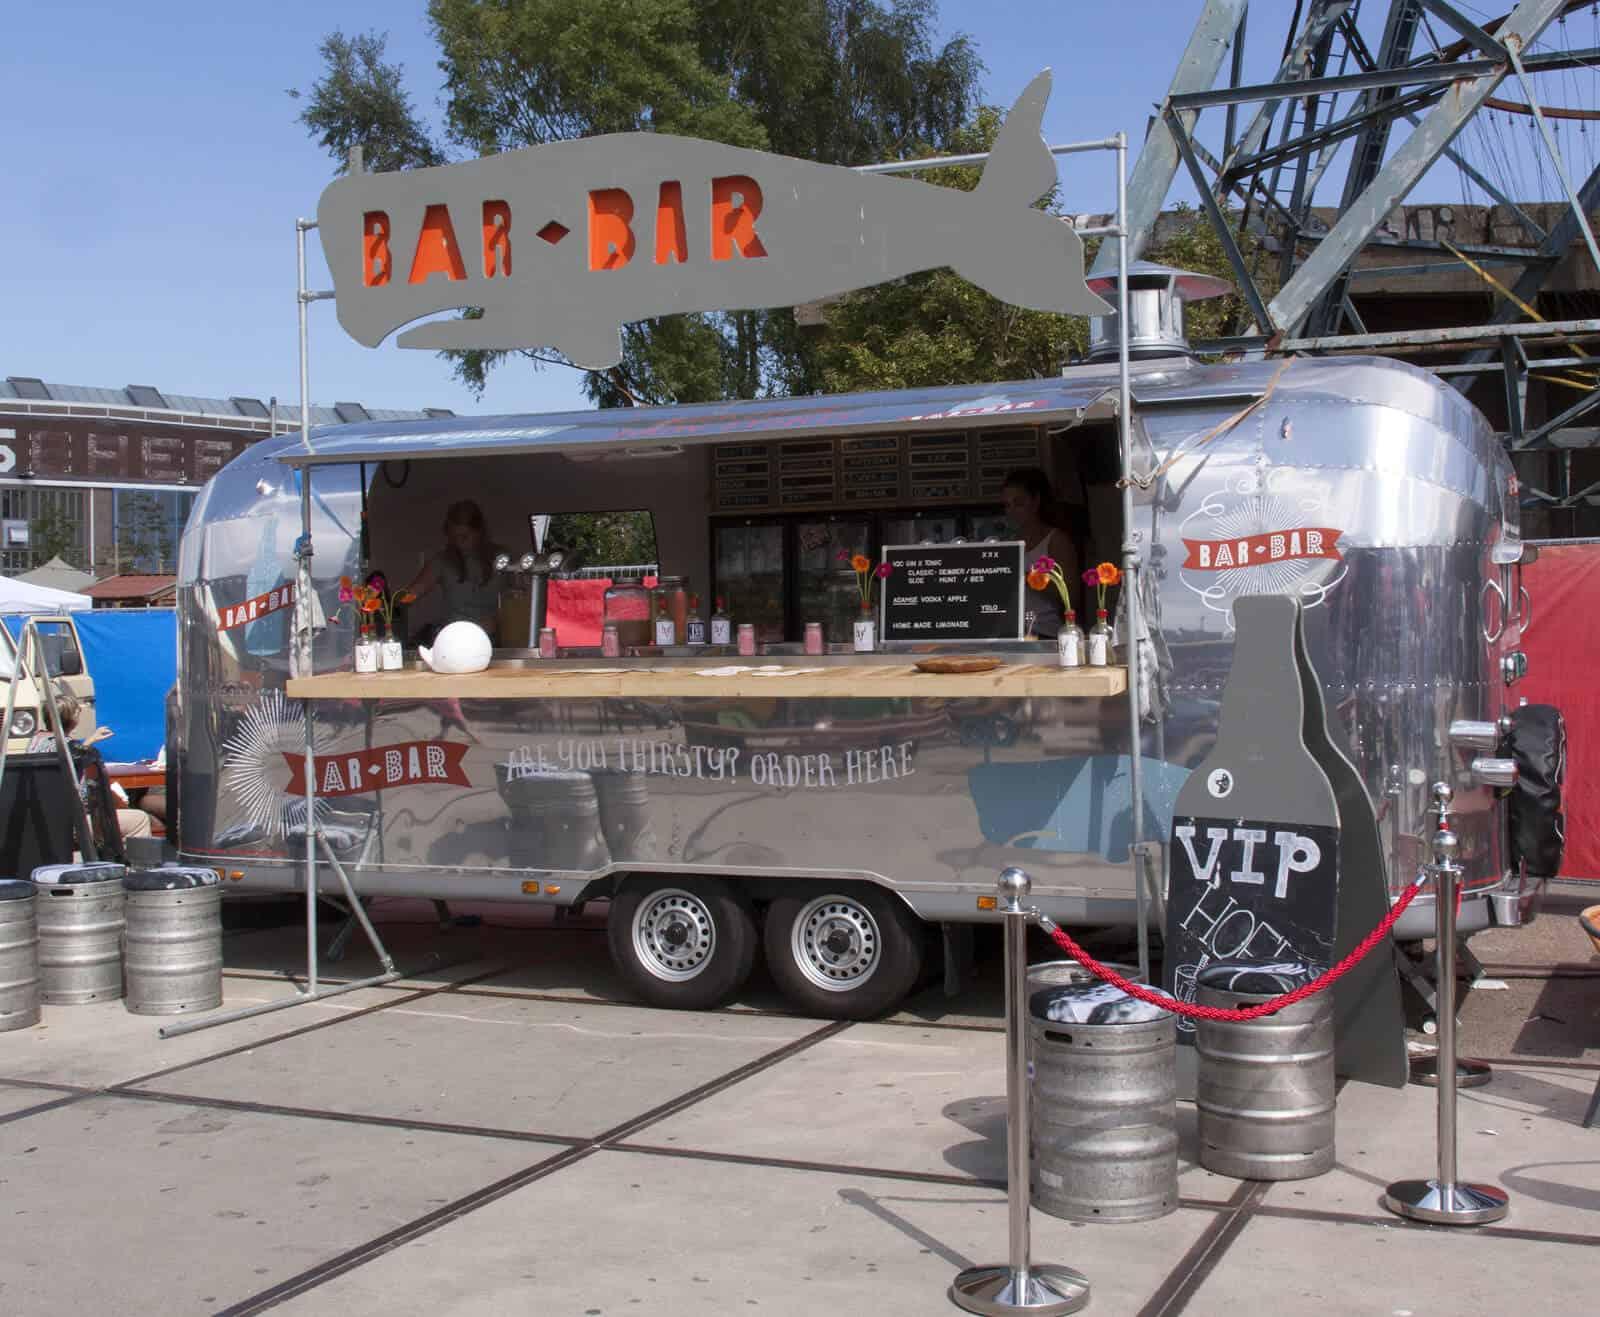 Caravan turned into food truck